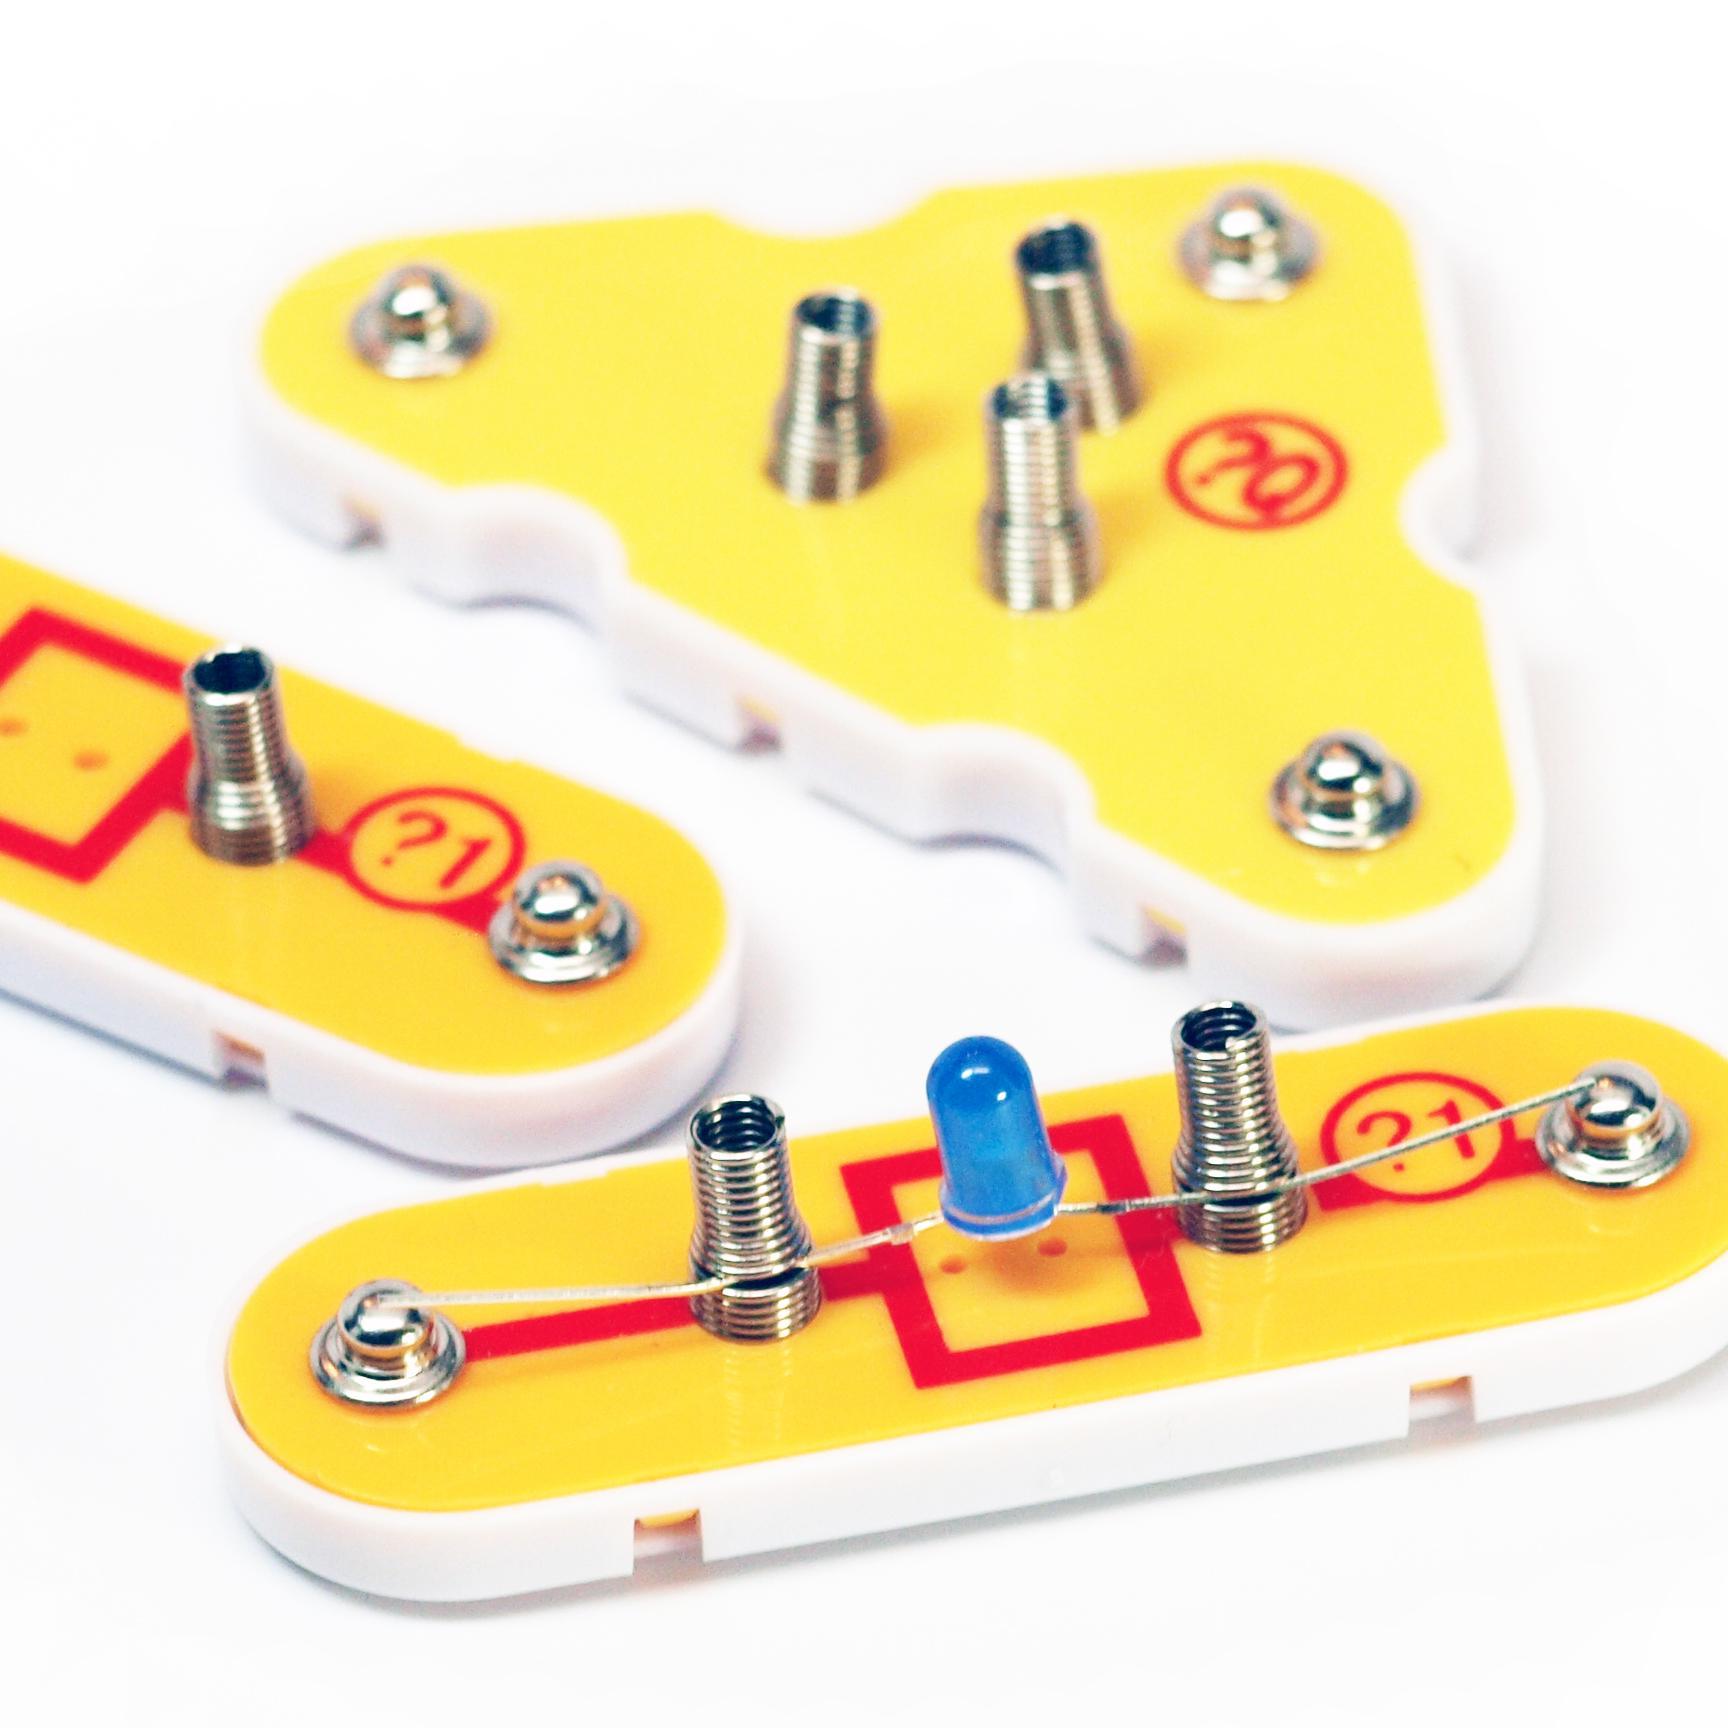 Snap Circuits Extreme Sc 750 Electronics Tiendamiacom Elenco Mini Kit Basic Electricity Toys View Larger